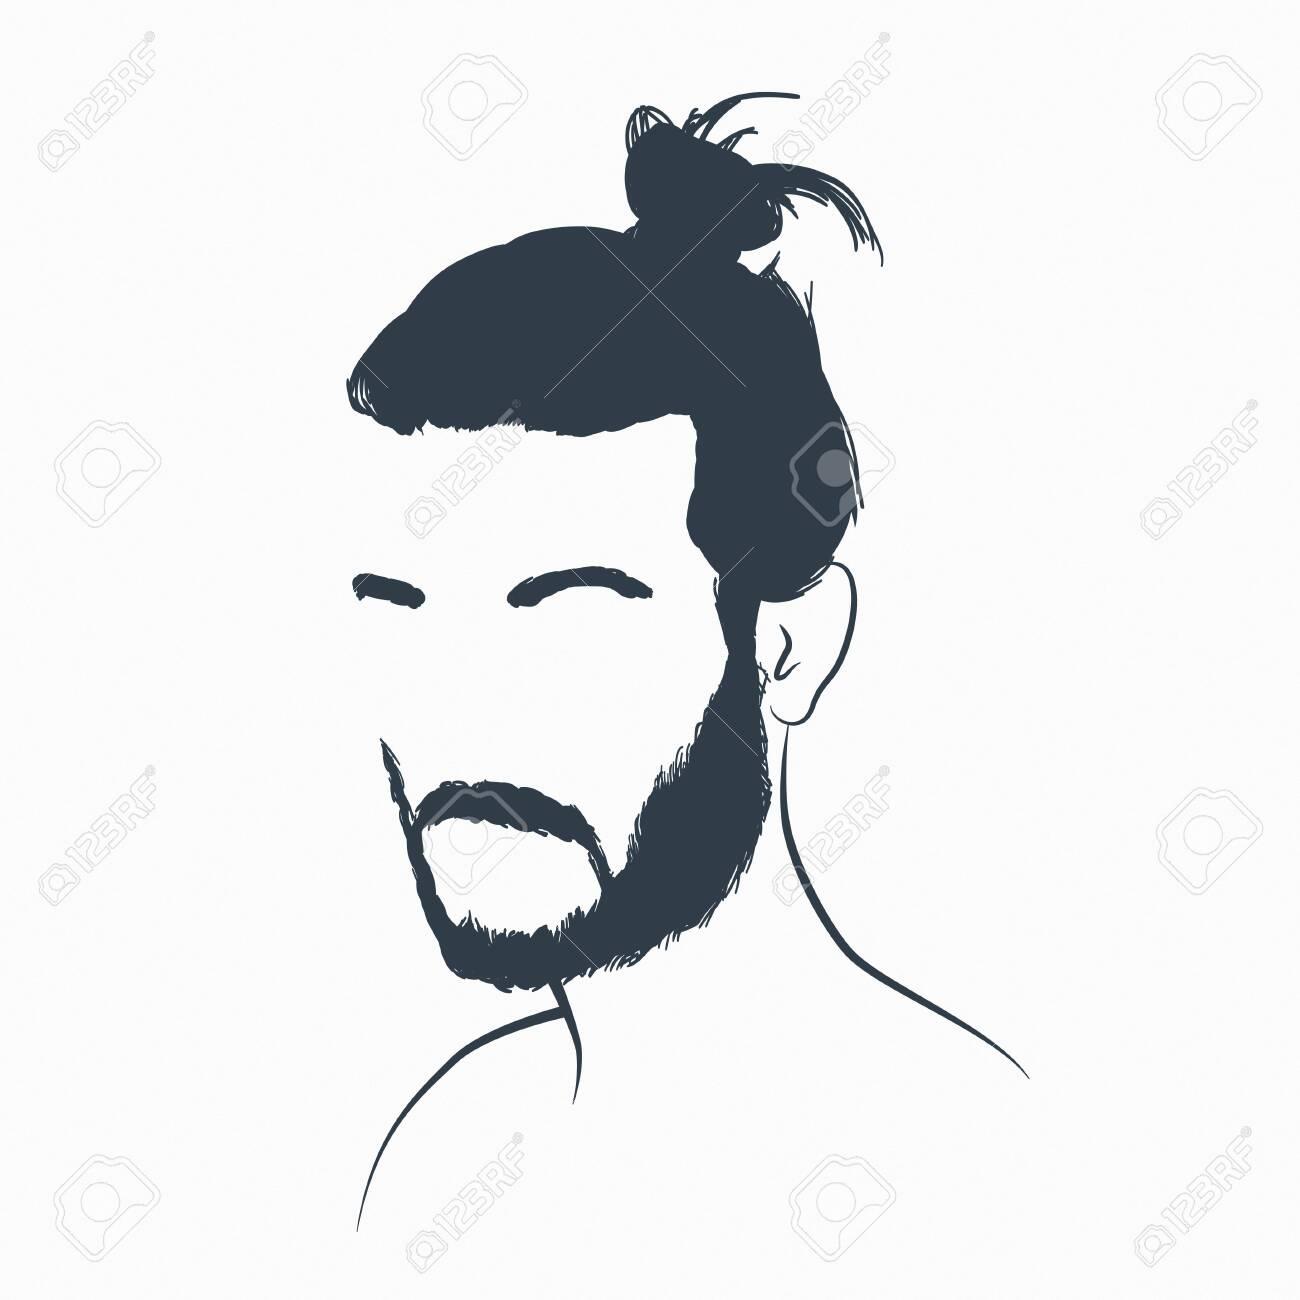 Beard And Bun. Pencil Sketch.. Royalty